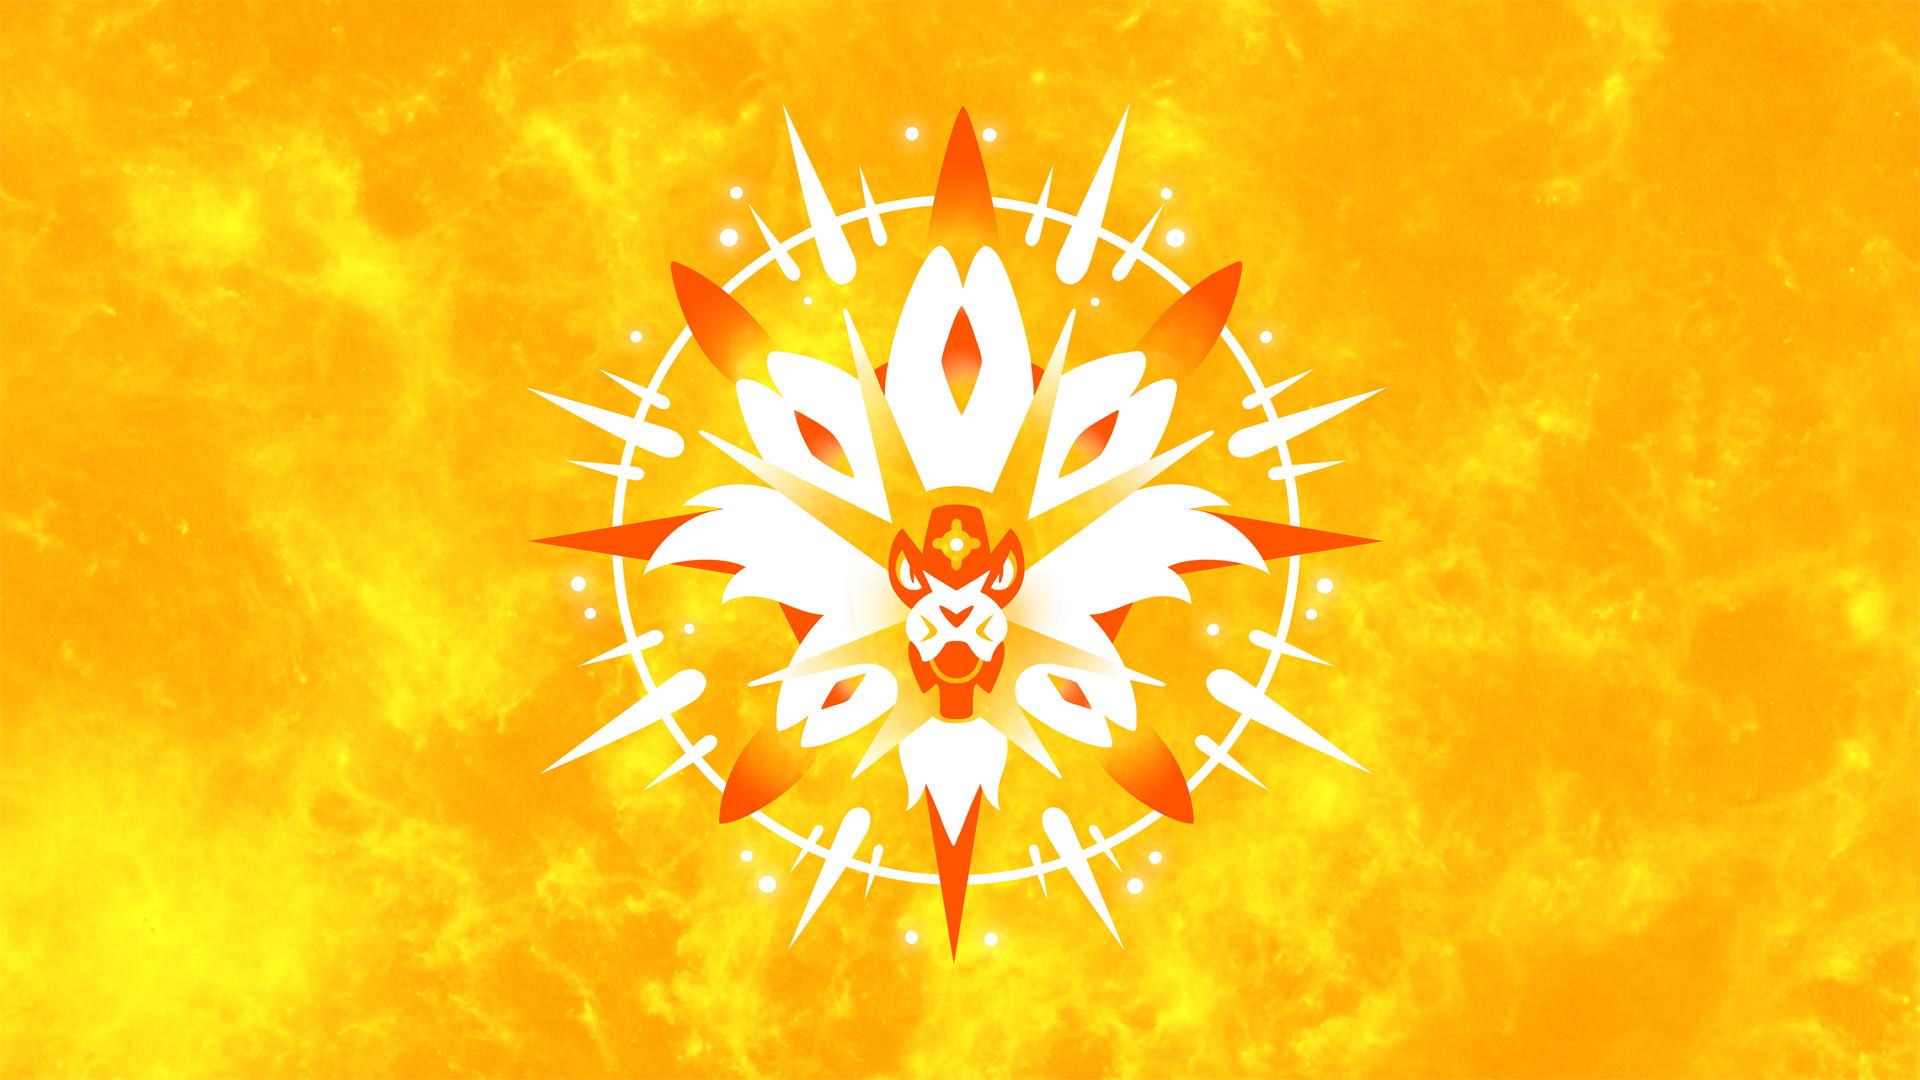 Video Game РPok̩mon Sun and Moon Solgaleo (Pok̩mon) Wallpaper